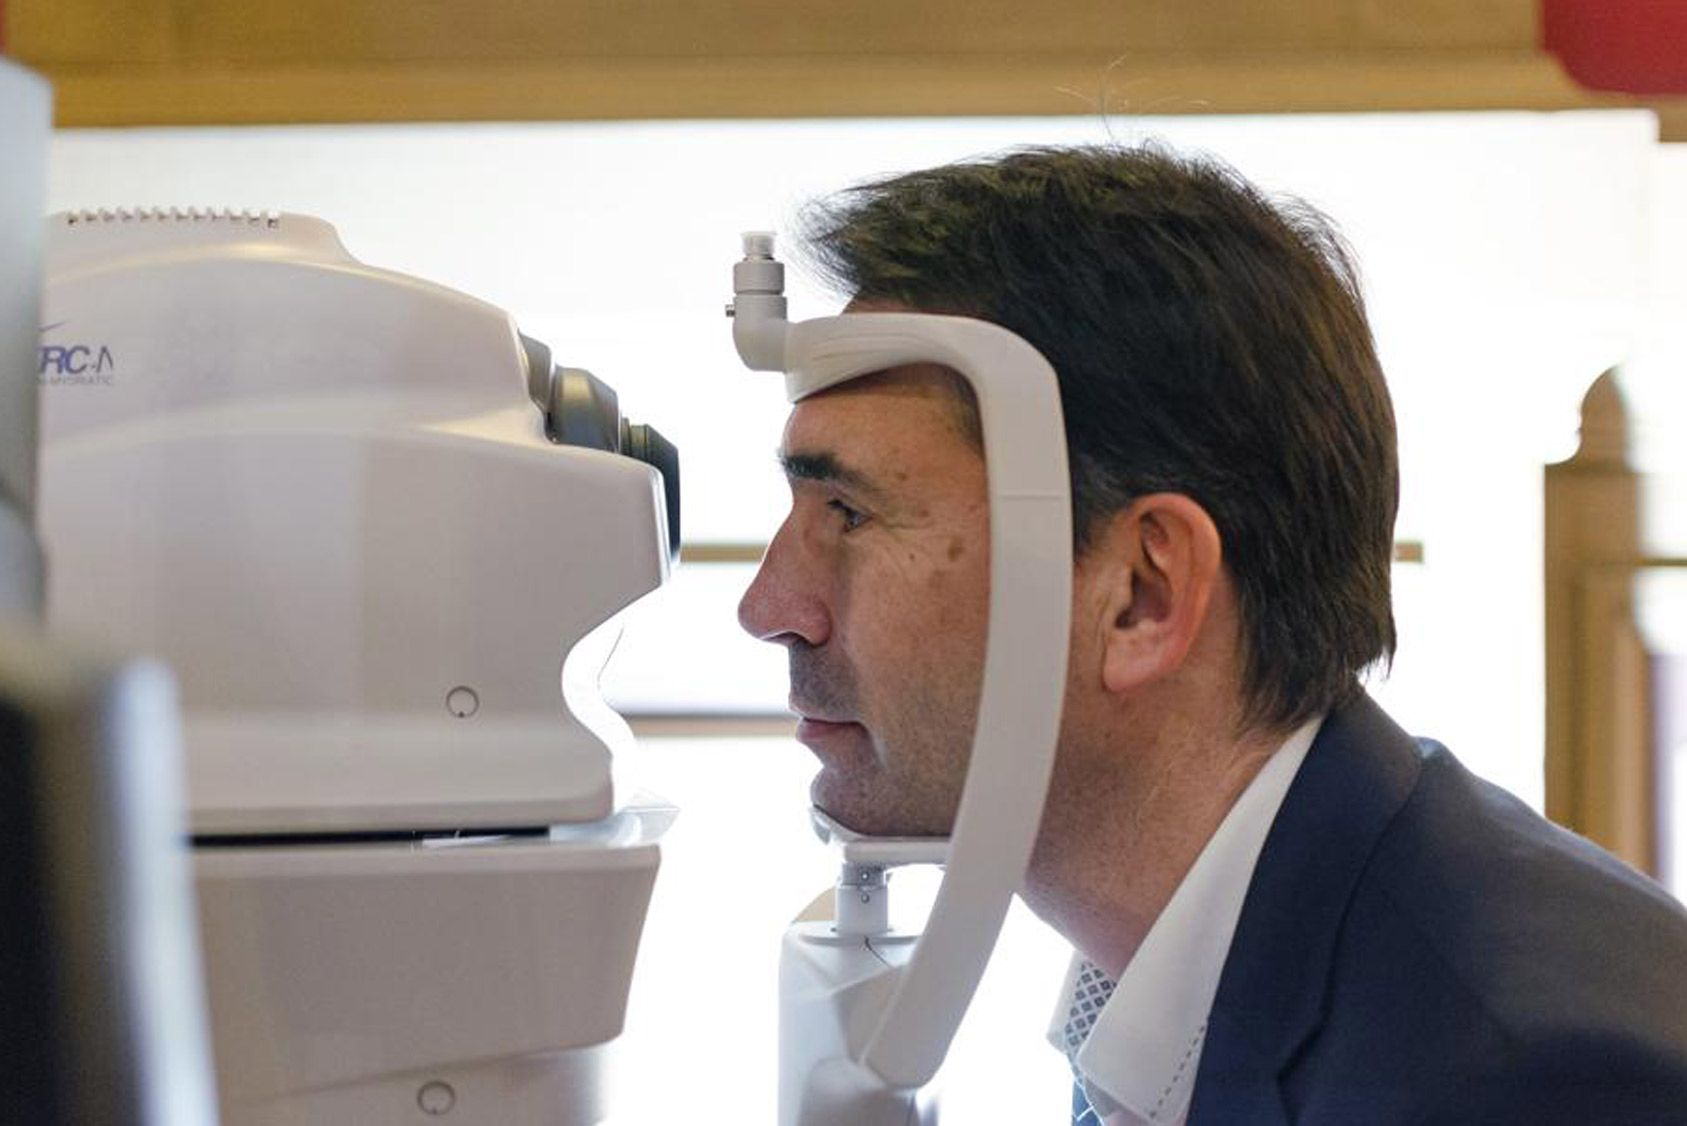 E-ophtalmo: fond d'œil à distance